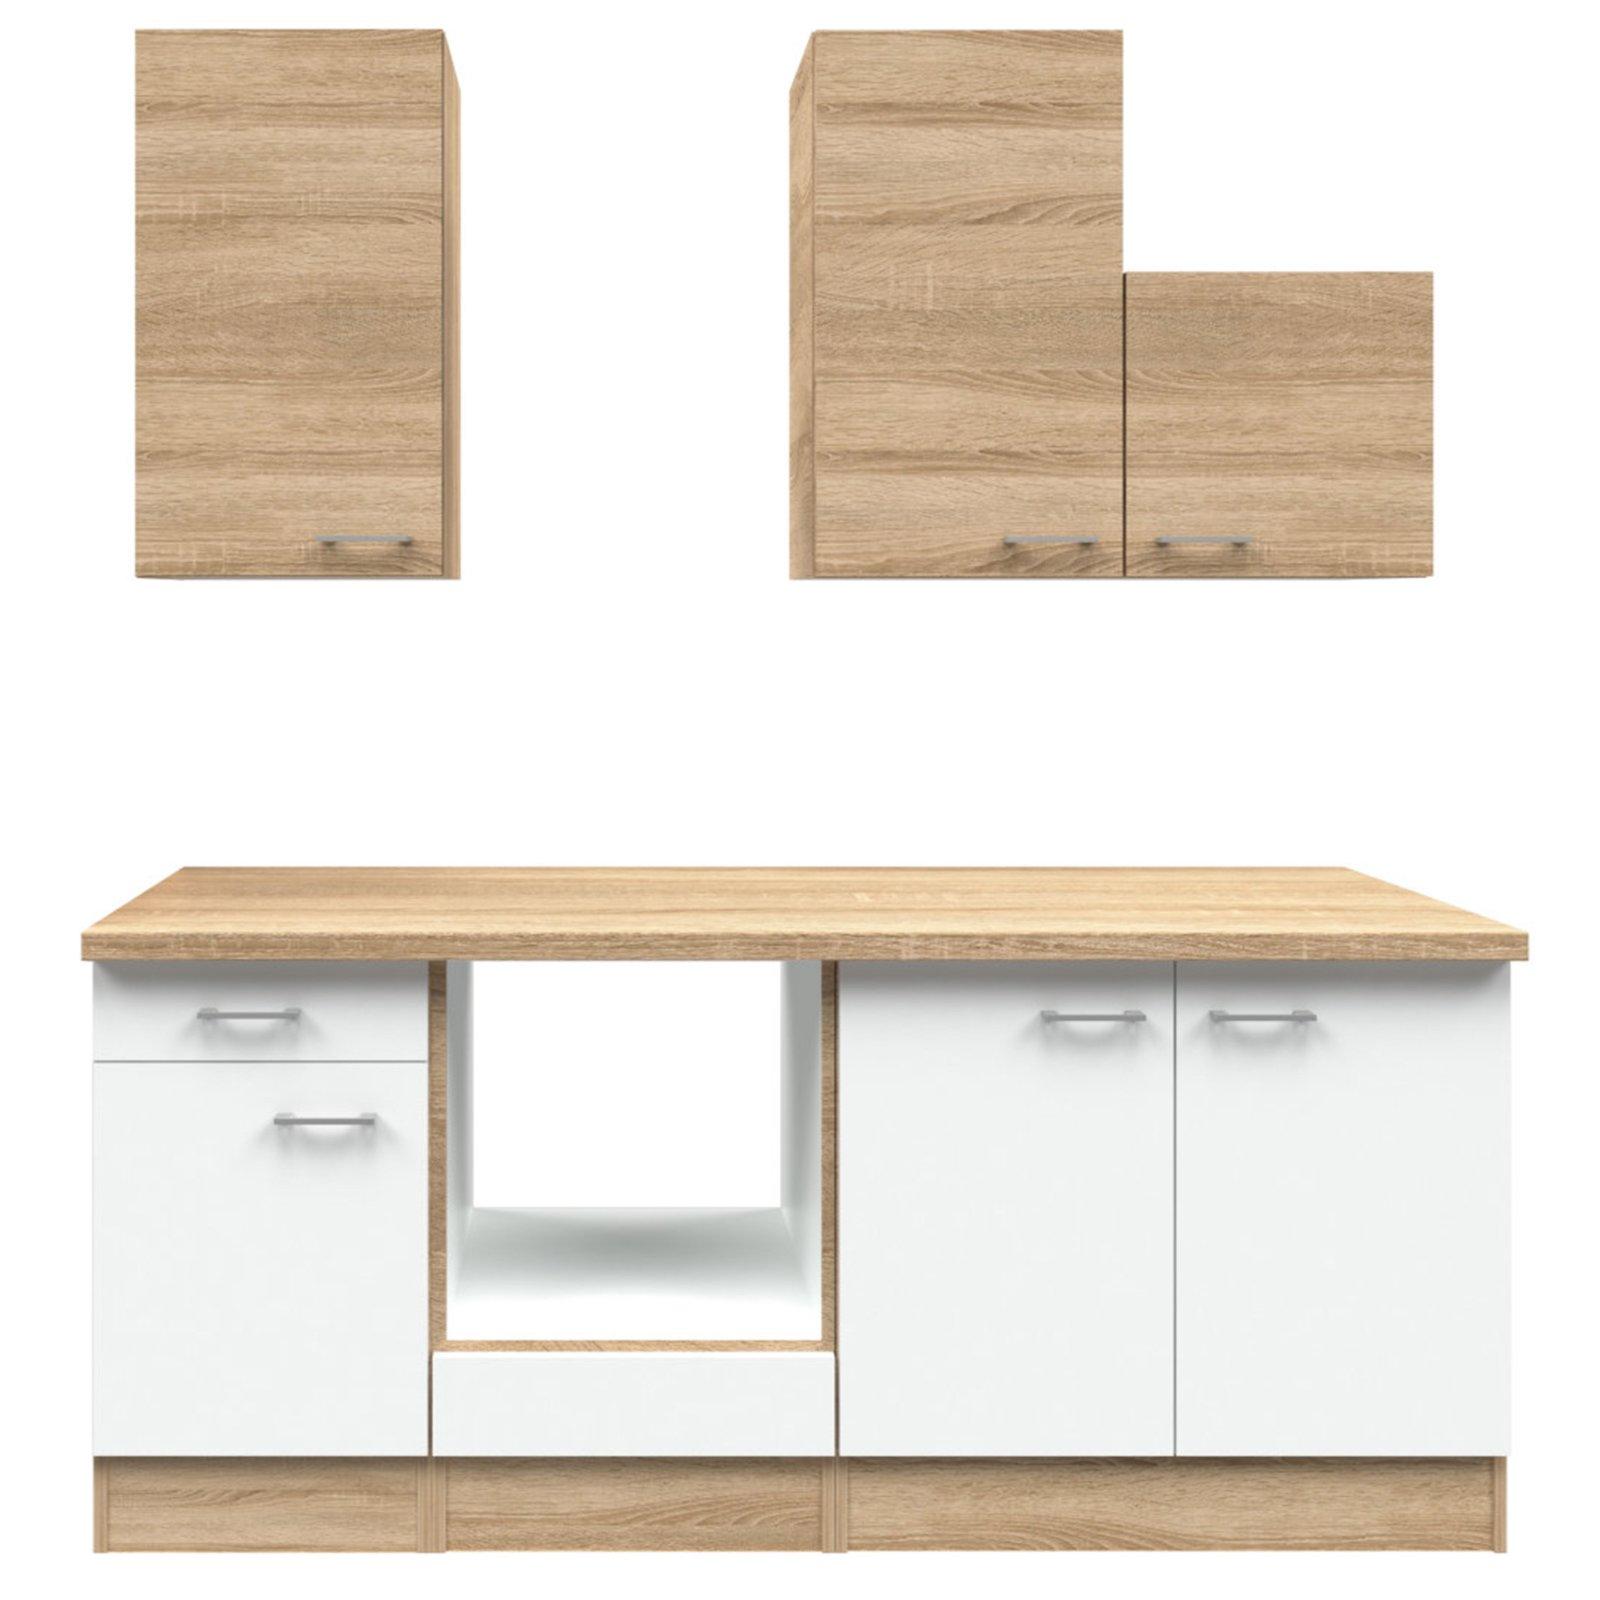 k chenblock samoa wei sonoma eiche 210 cm k chenzeilen ohne e ger te k chenzeilen. Black Bedroom Furniture Sets. Home Design Ideas